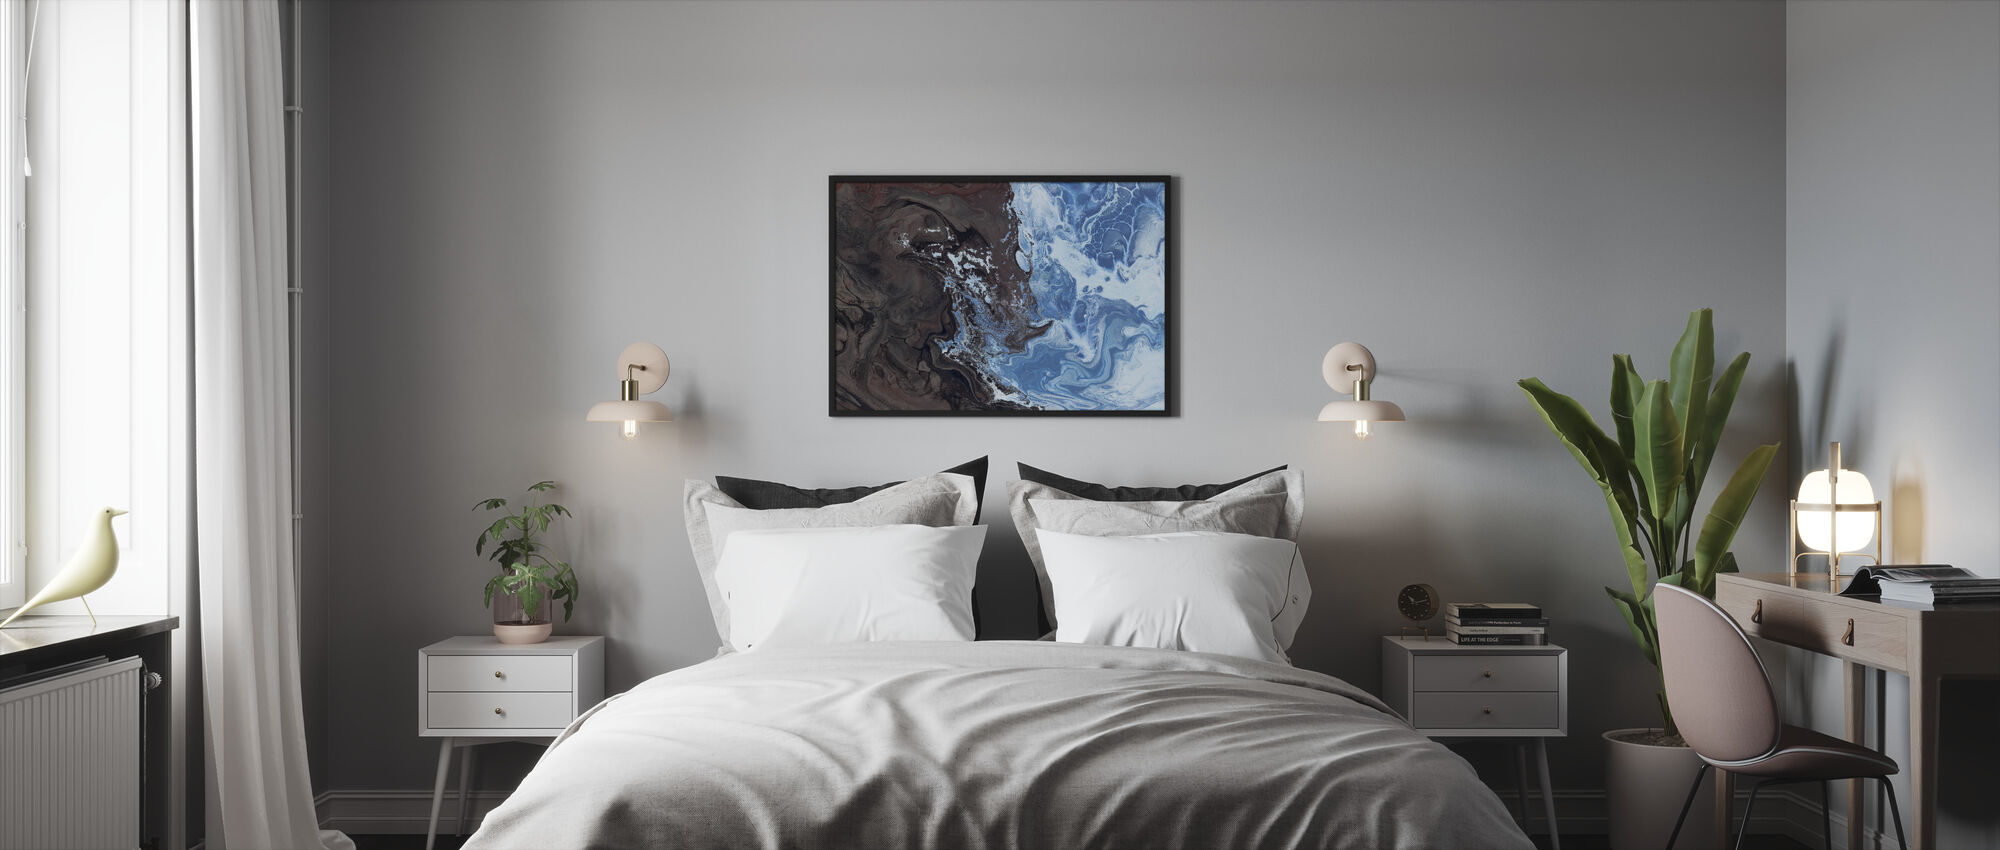 Konst Textur - Inramad tavla - Sovrum